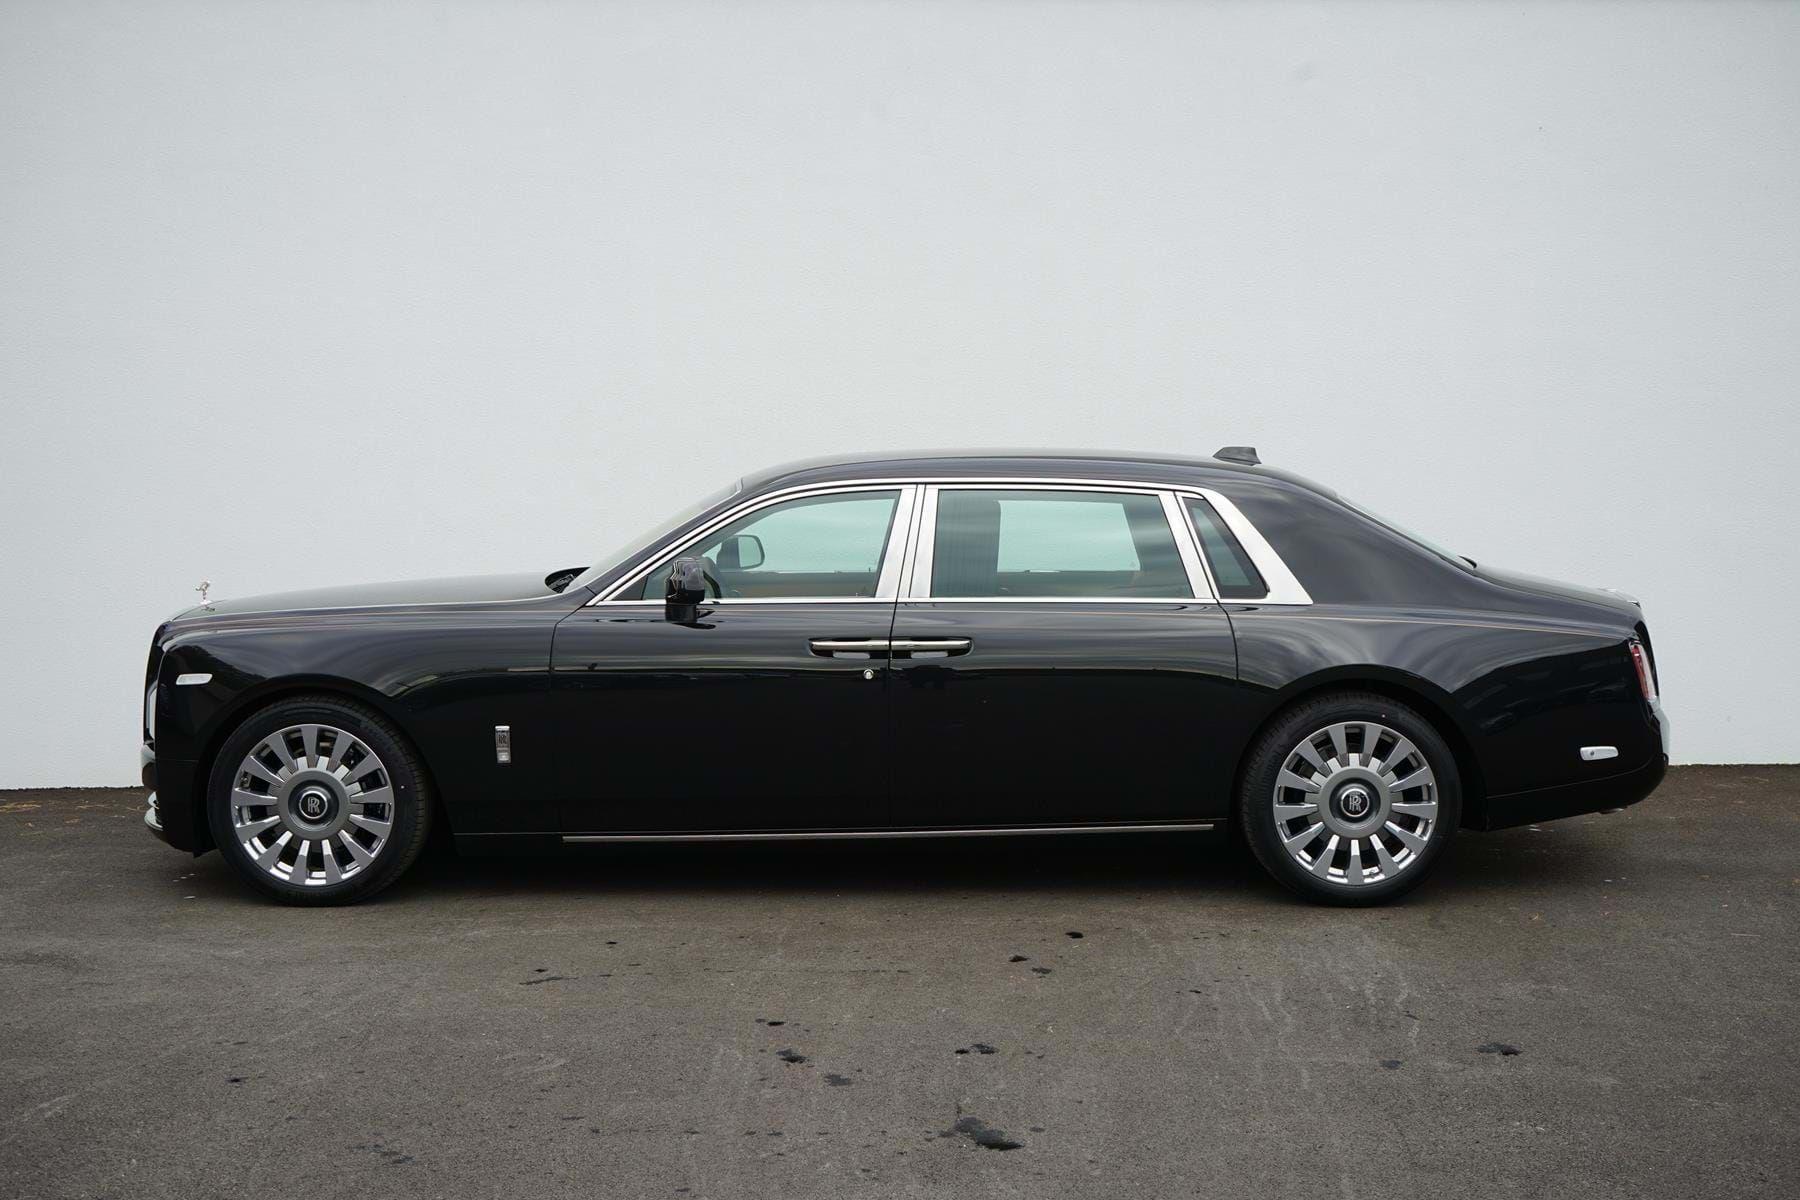 Rolls Royce Phantom Viii Extended Wheelbase Luxury Pulse Cars Swaziland For Sale On Luxurypulse Rolls Royce Phantom Rolls Royce Royce